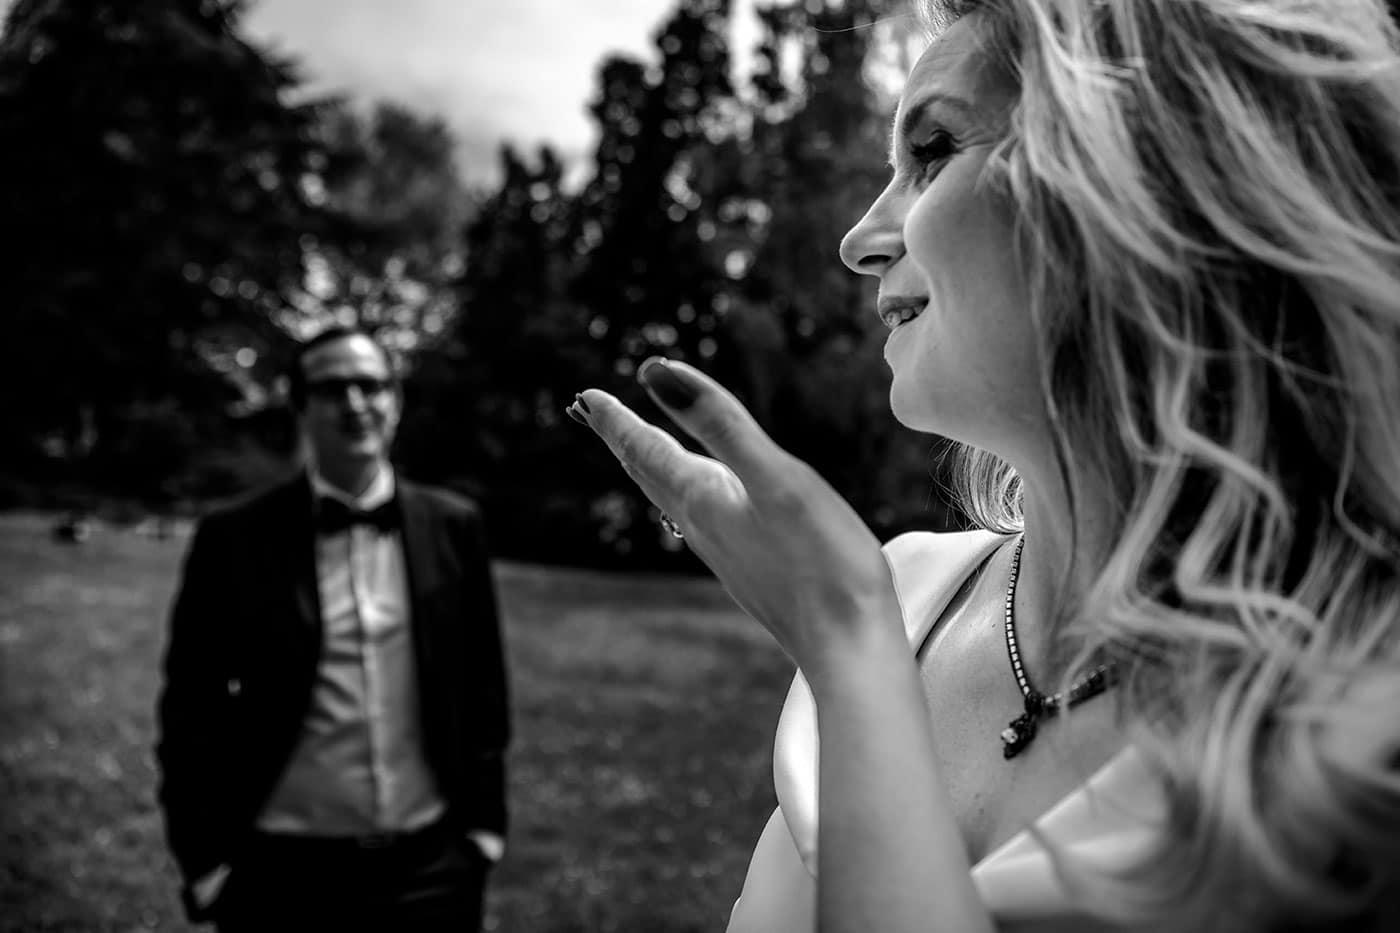 Photographe mariage Sainte Foy les Lyon. Castille ALMA photographe de mariage, reportage de mariage.